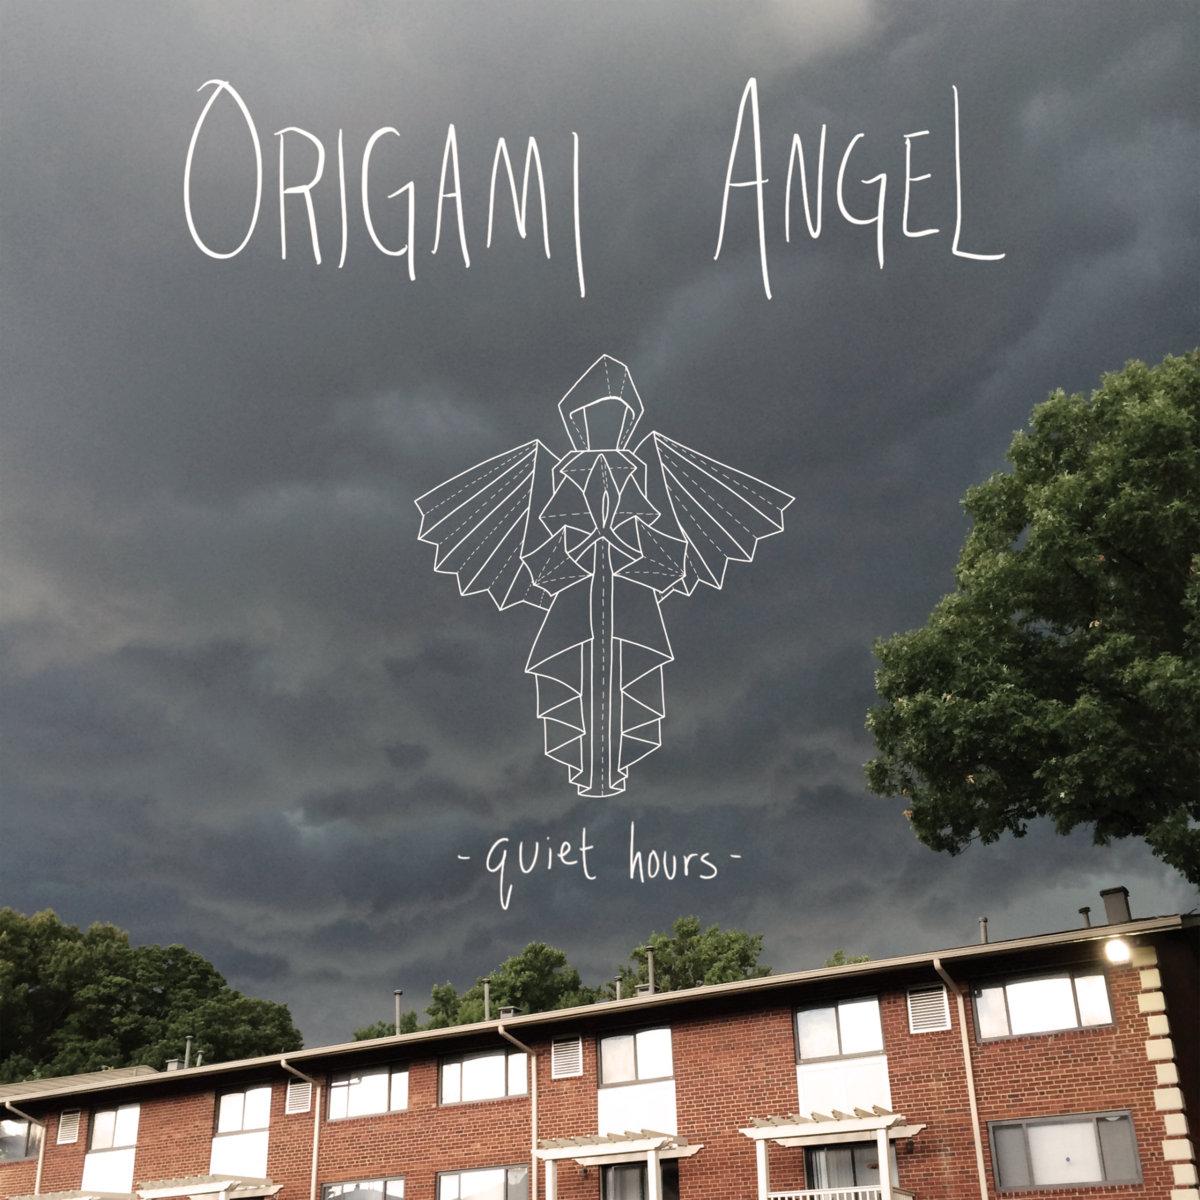 Angel origami | Origami art, Origami, Origami nativity | 1200x1200